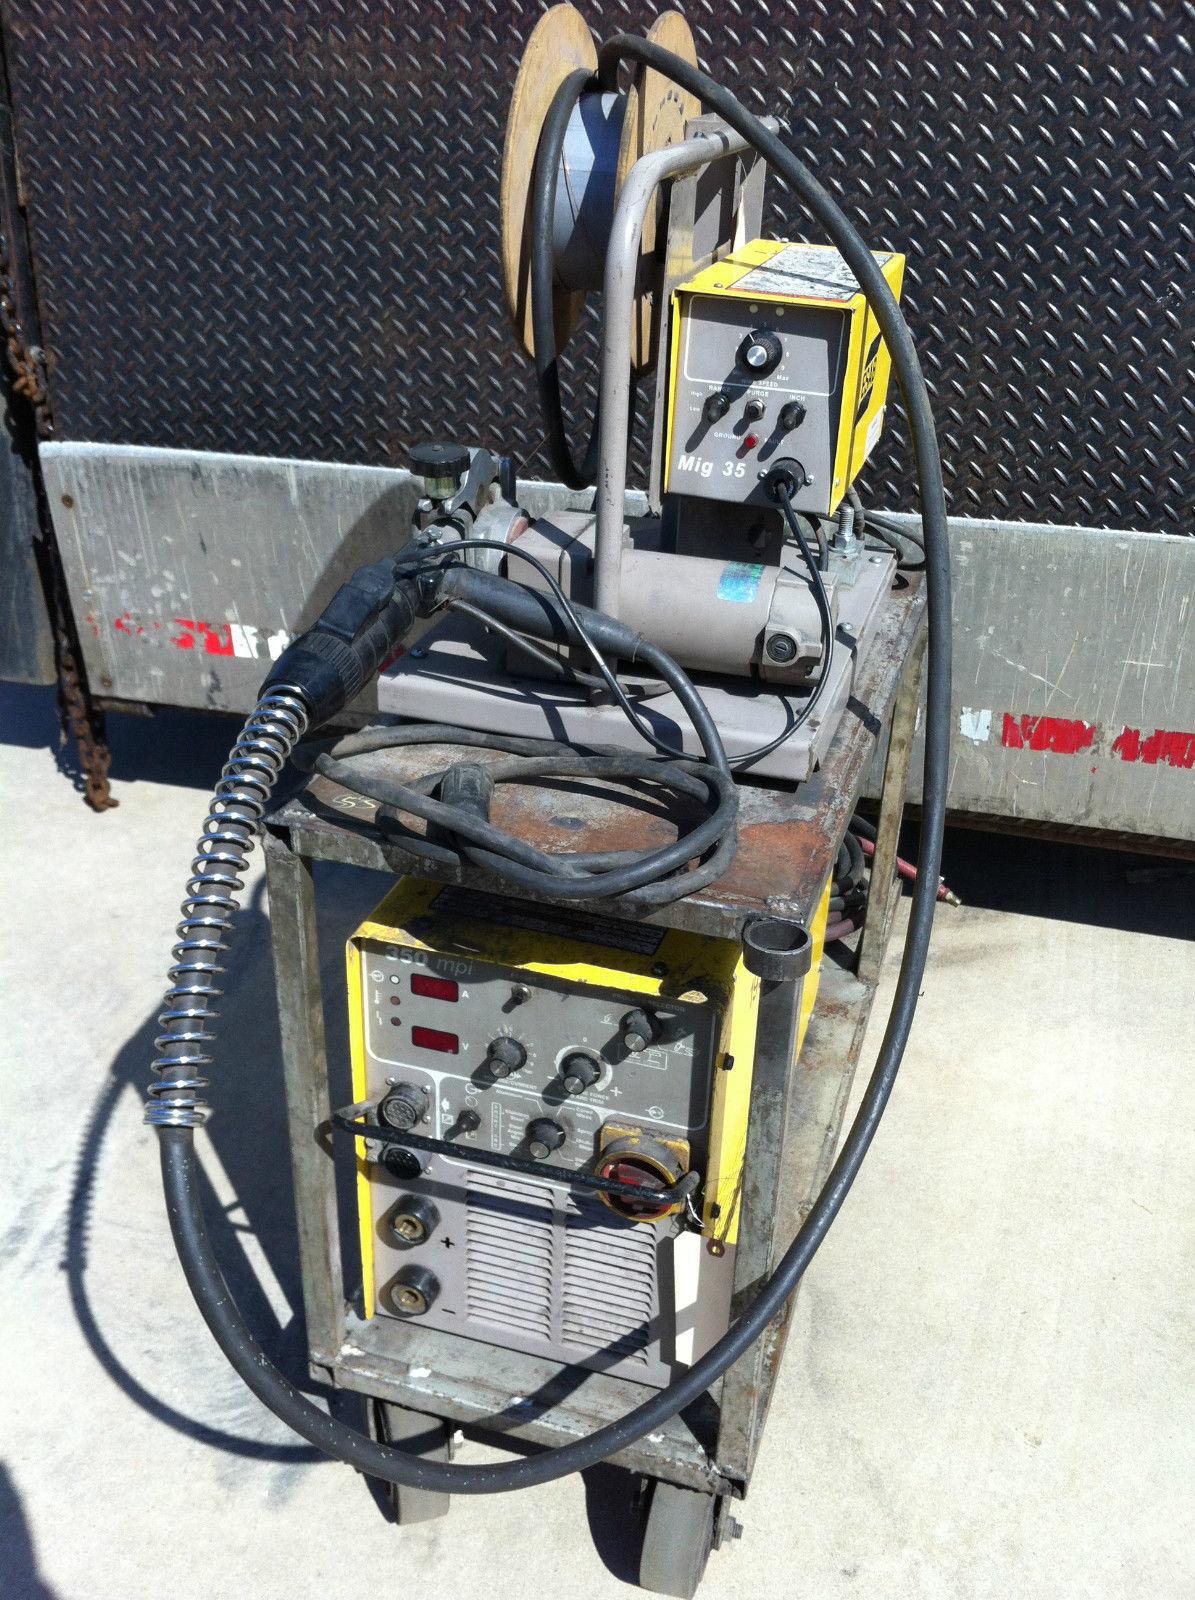 Esab 350 Mpi Multi Process Mig Tig Welder and 50 similar items